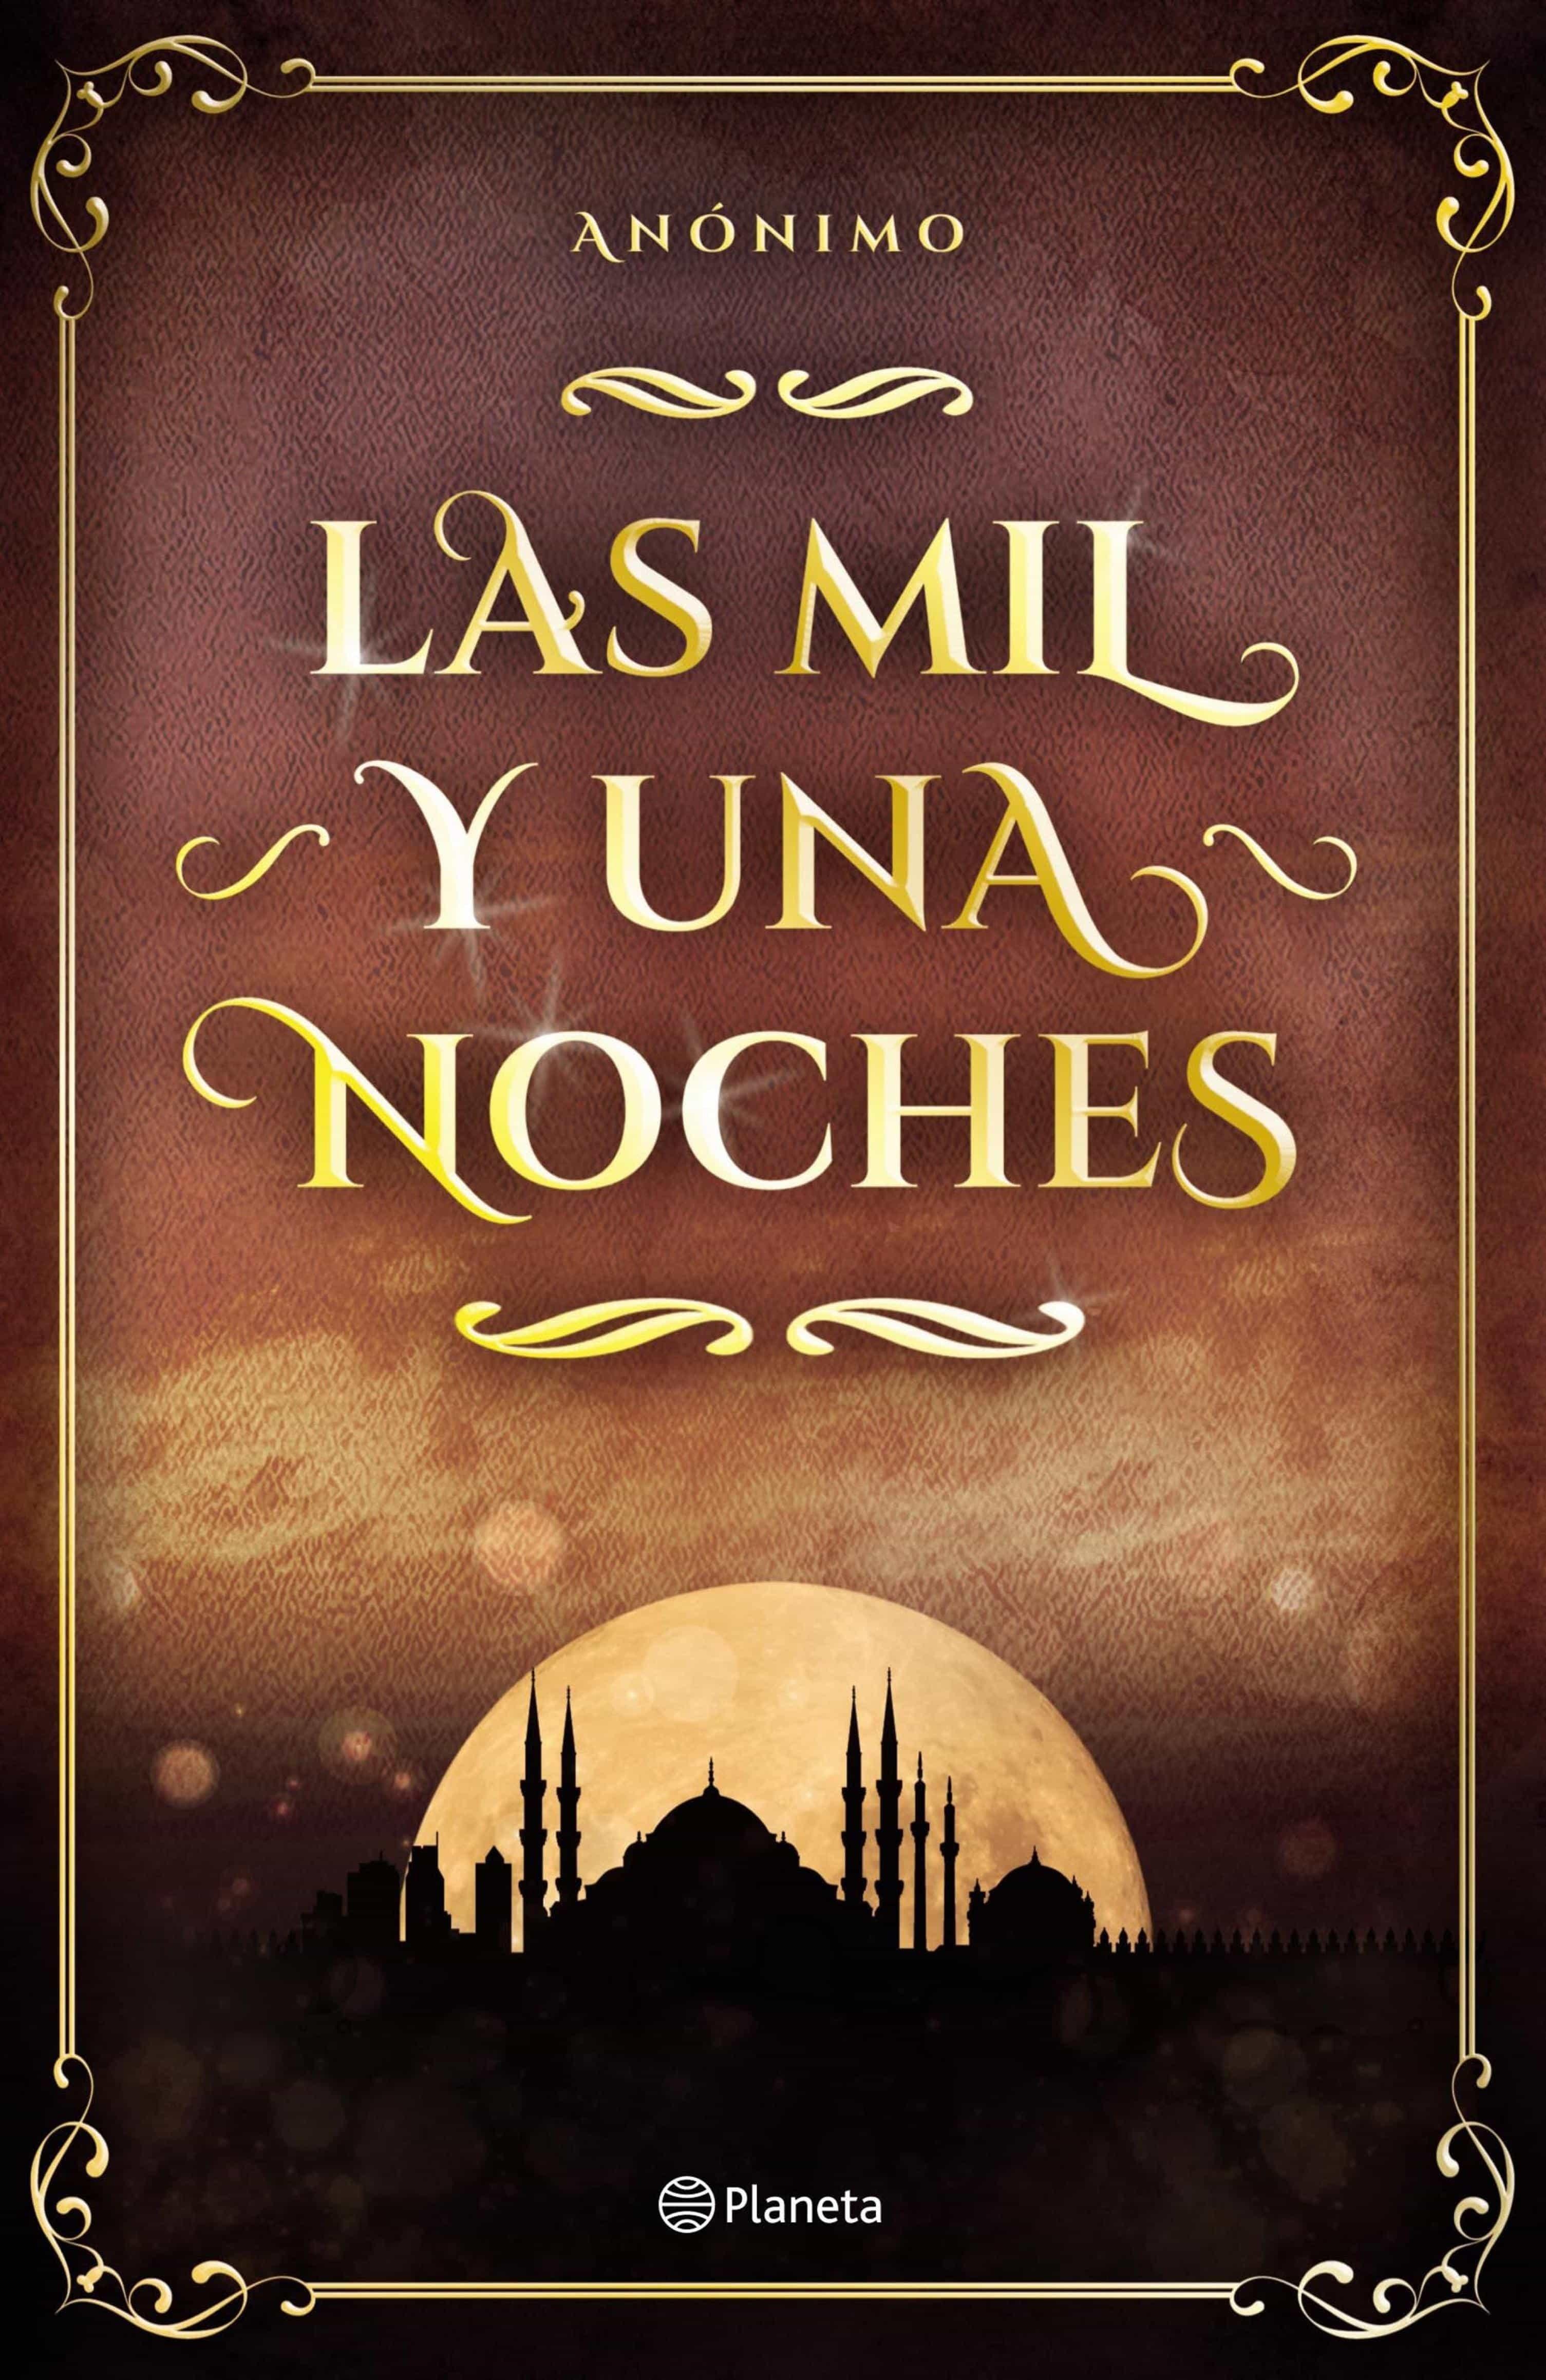 https://www.goodreads.com/book/show/31116477-las-mil-y-una-noches